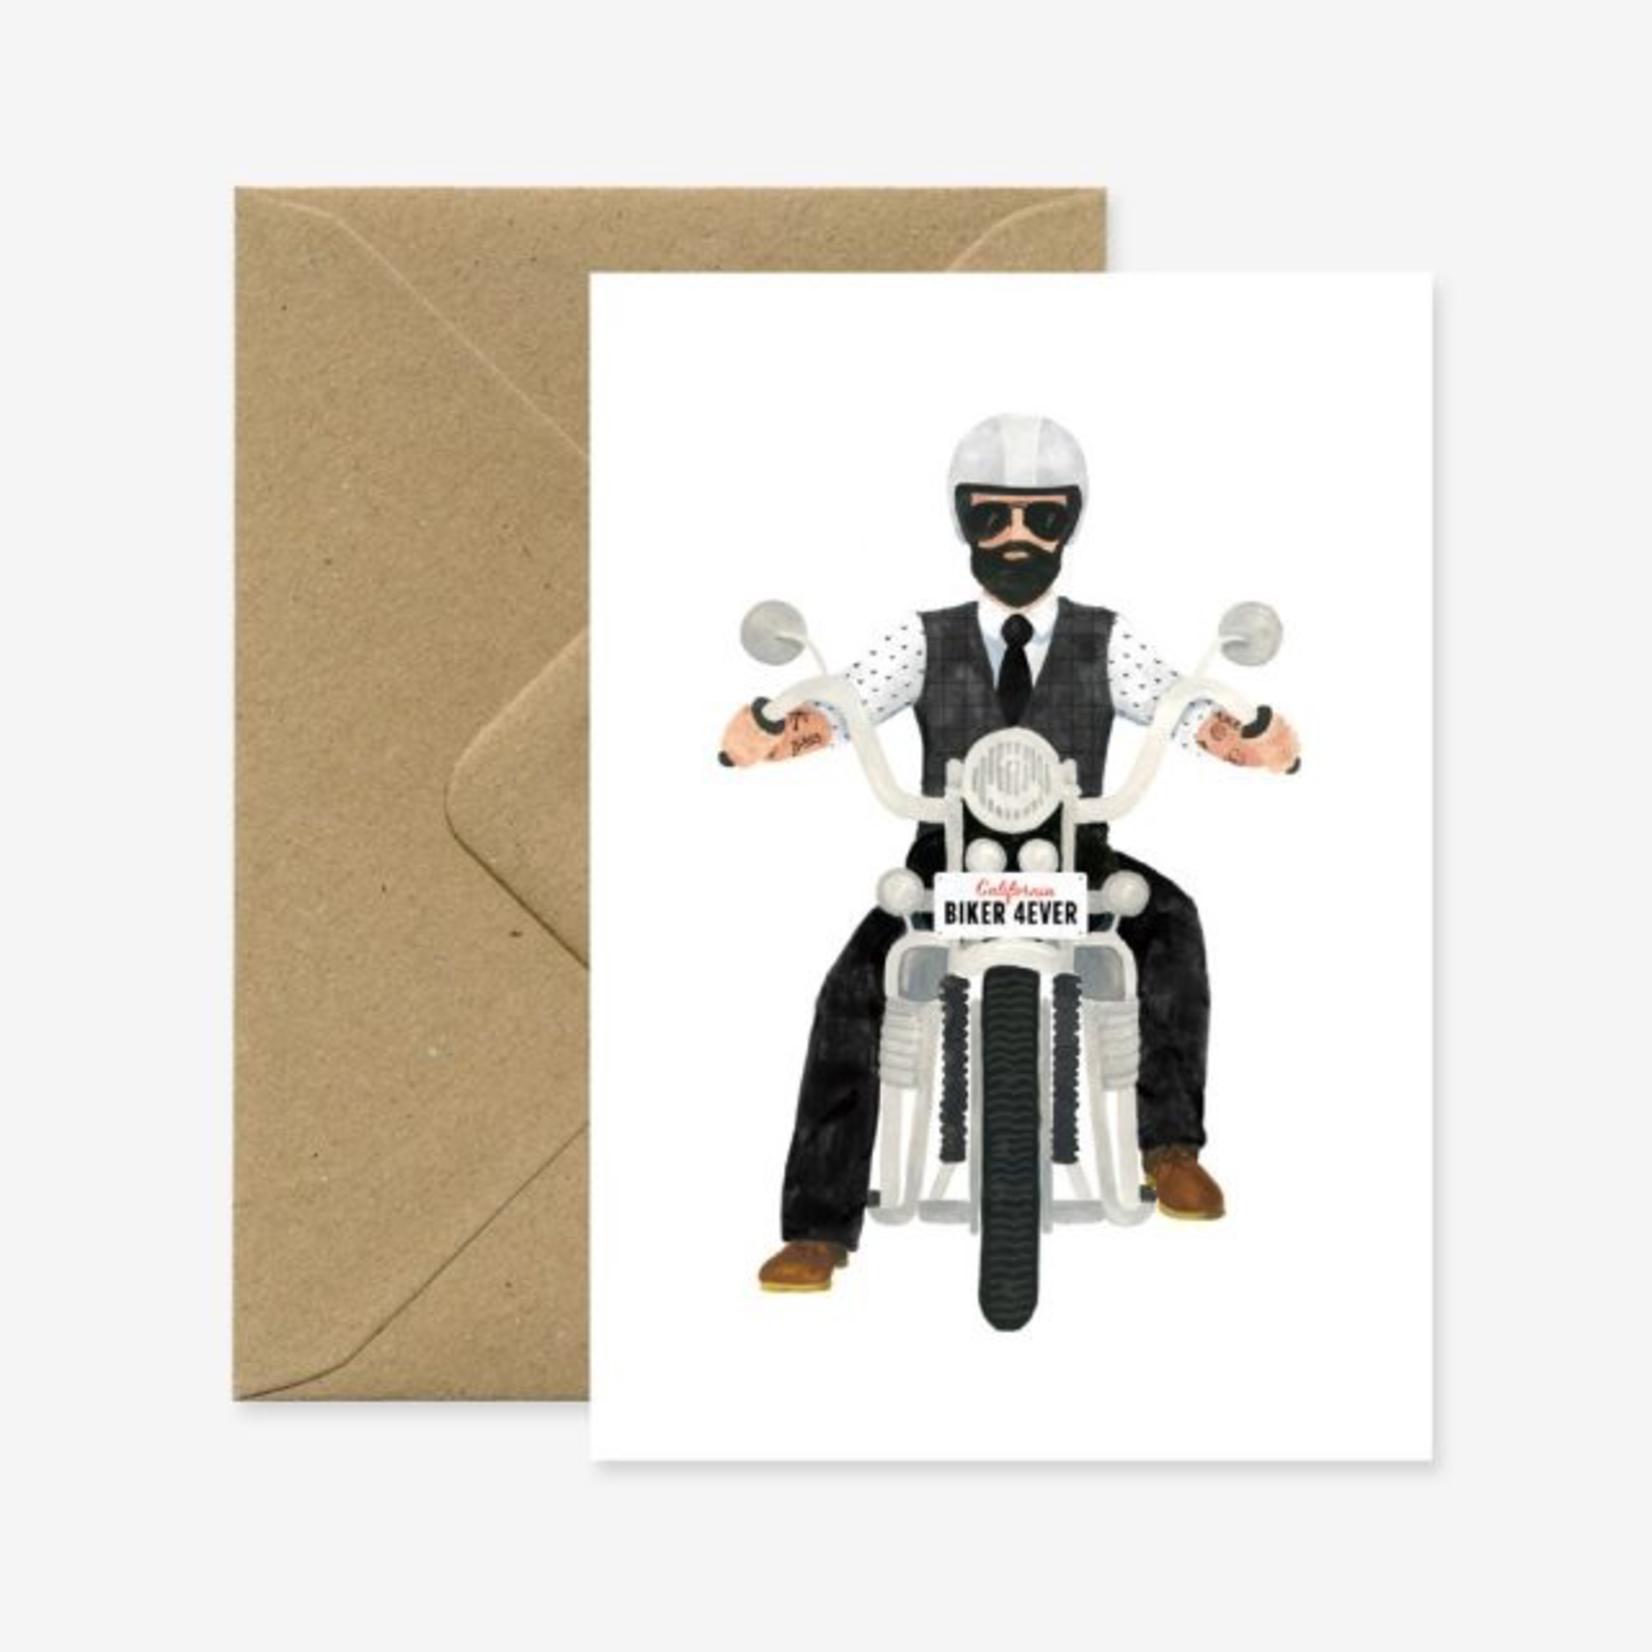 All The Ways To Say Biker Forever - Beardy Biker Boy Card